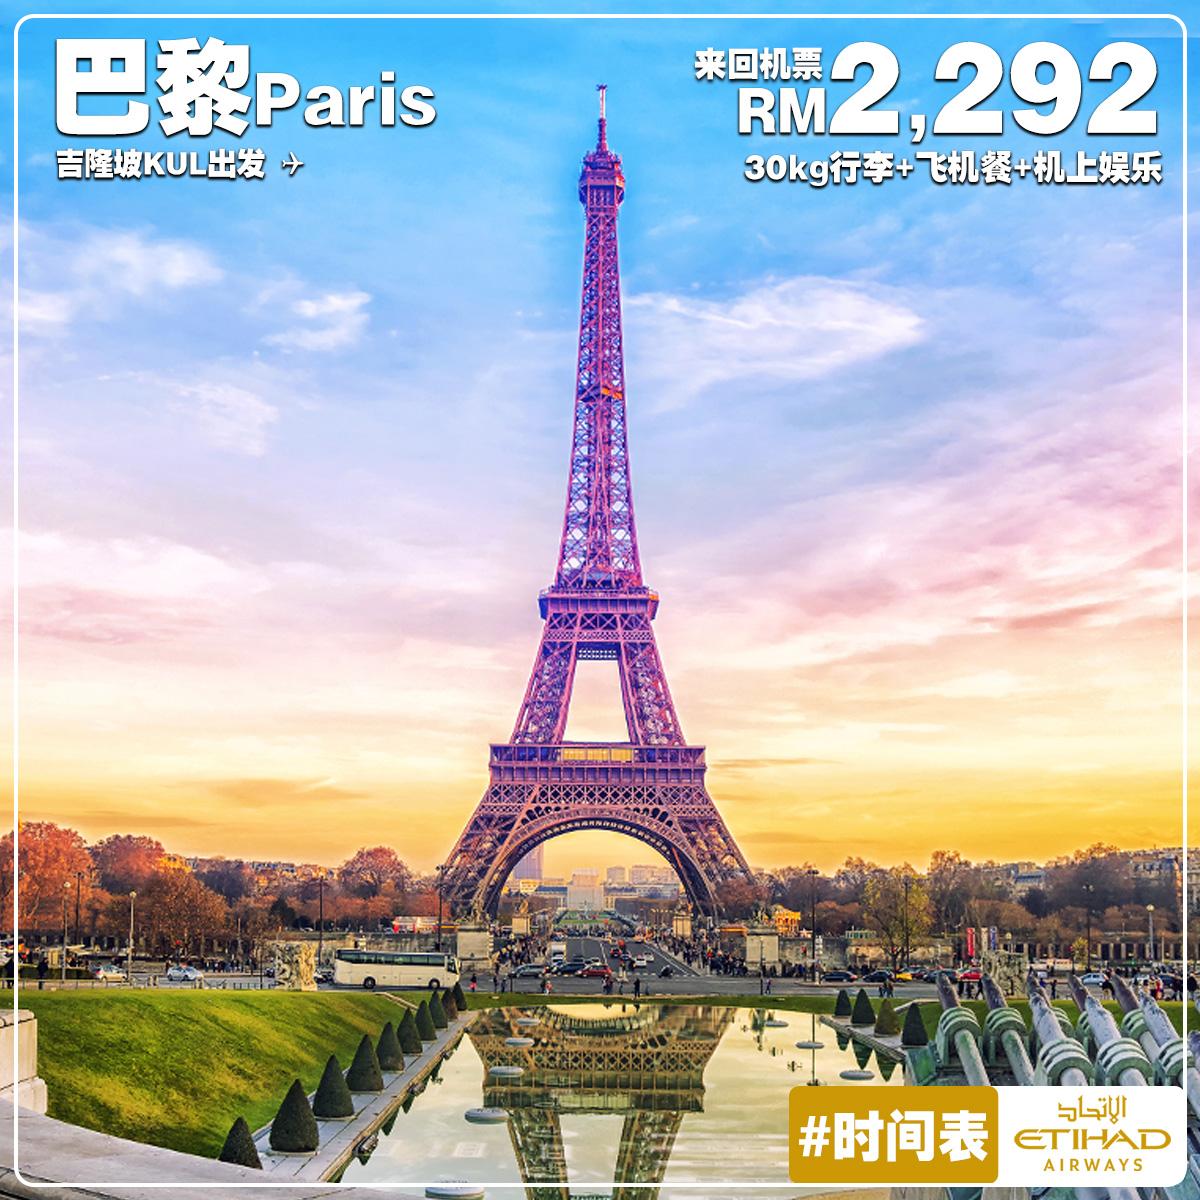 Photo of 【欧洲Europe优惠】吉隆坡KUL — 巴黎Paris 来回RM2,292!包括30kg行李+飞机餐![Exp: 23 Feb 2019]